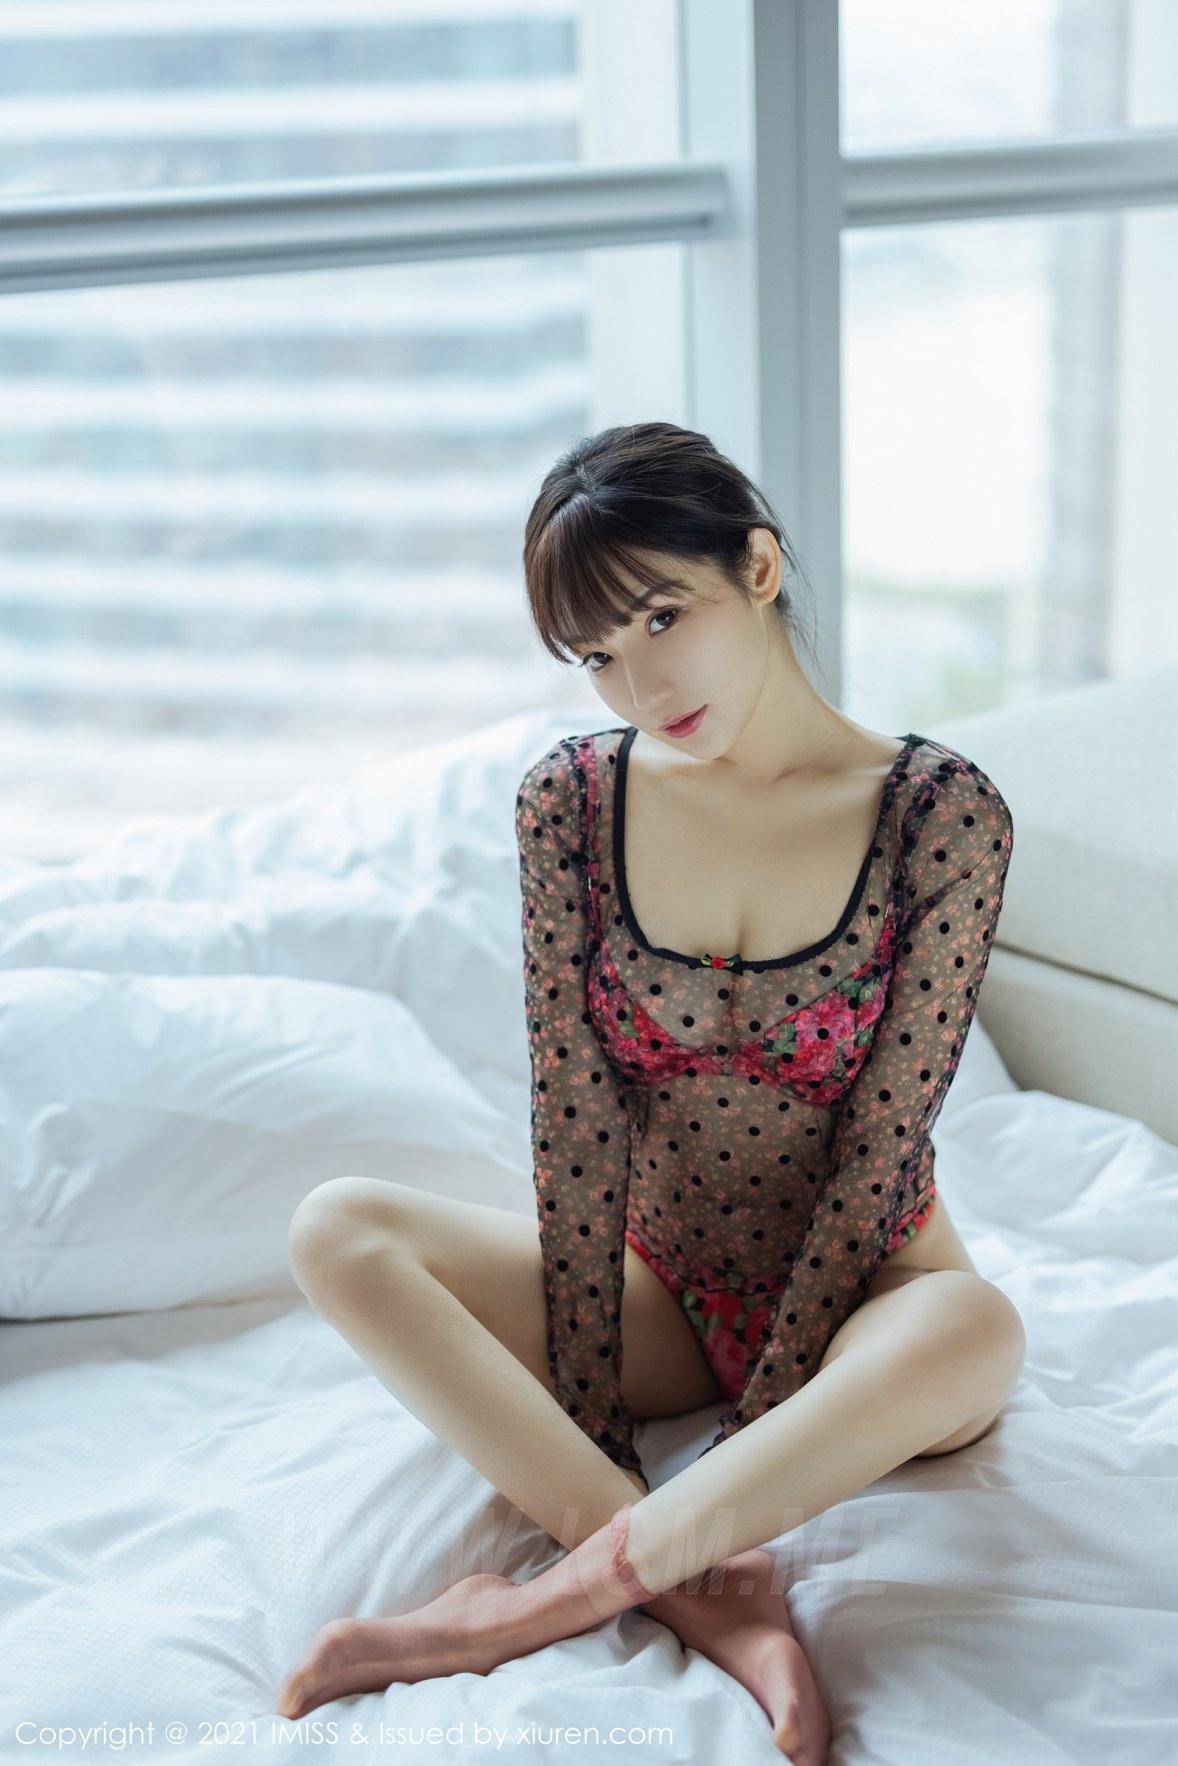 IMiss 爱蜜社 Vol.574 小狐狸Kathryn 色彩鲜艳诱人的内衣 - 3